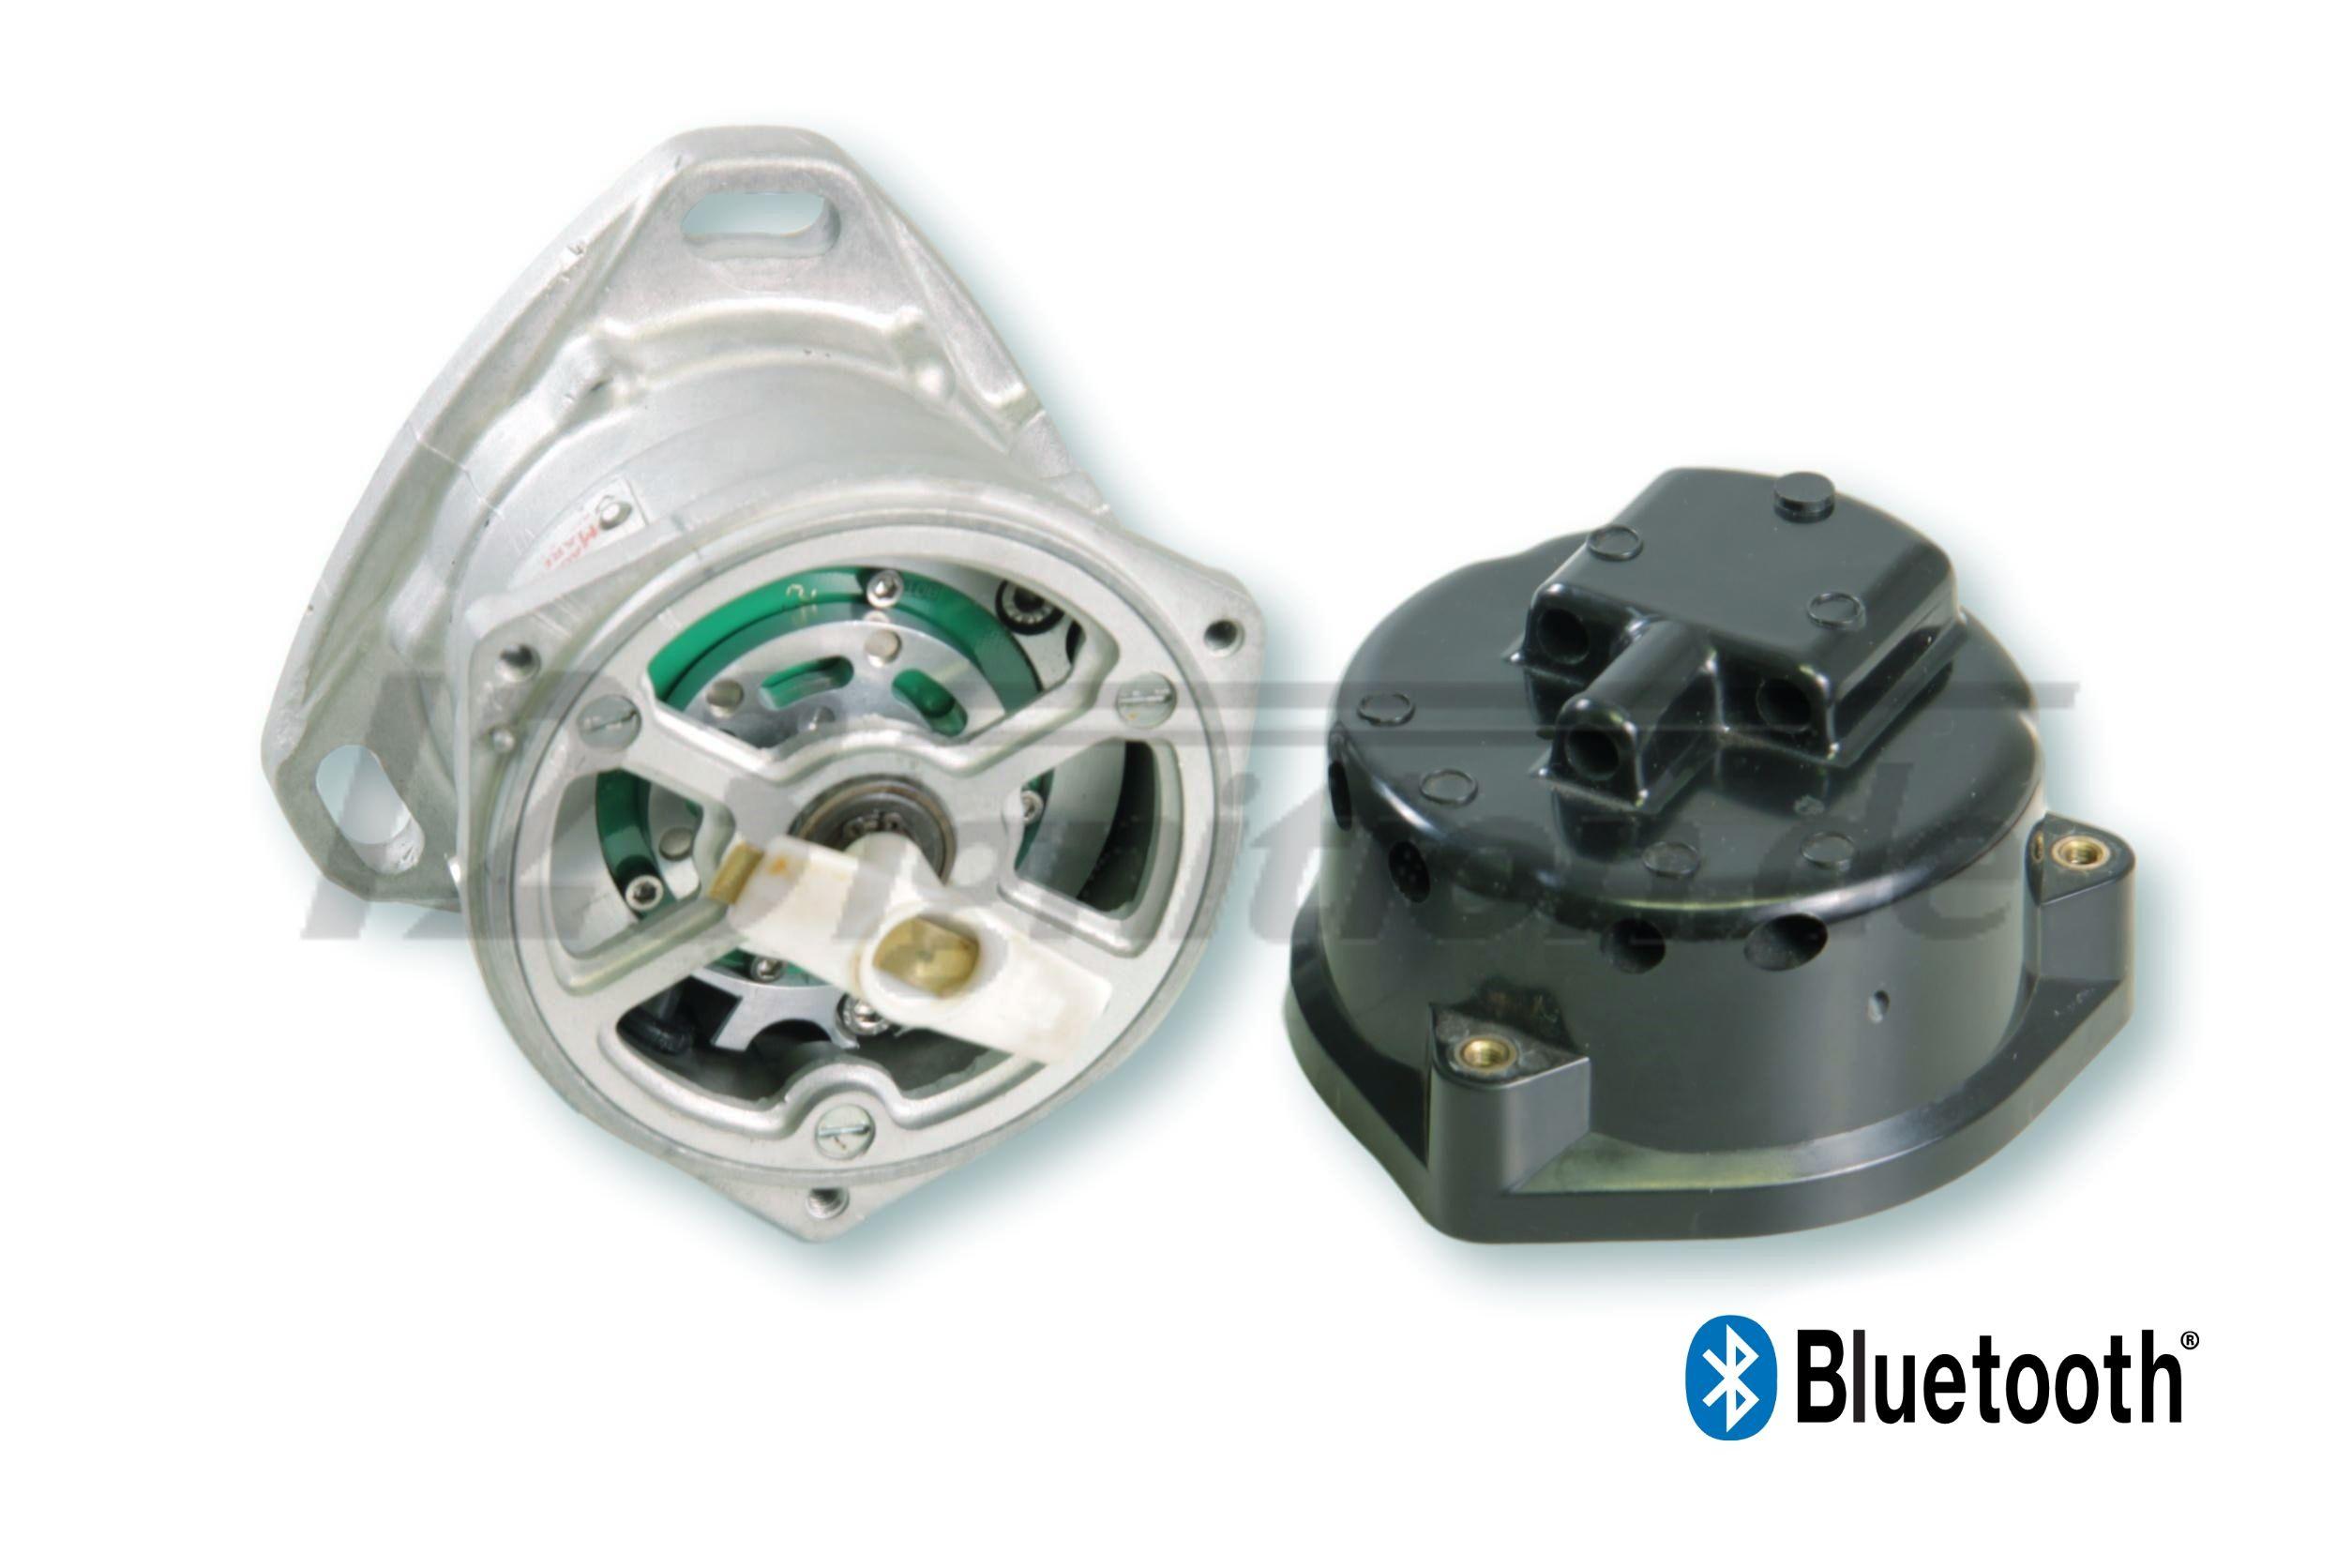 Allumeur 123 TUNE+ Bluetooth pour Ferrari 365 GTB 4 Daytona bouchon de  distributeur ouvert 5de8637650ff